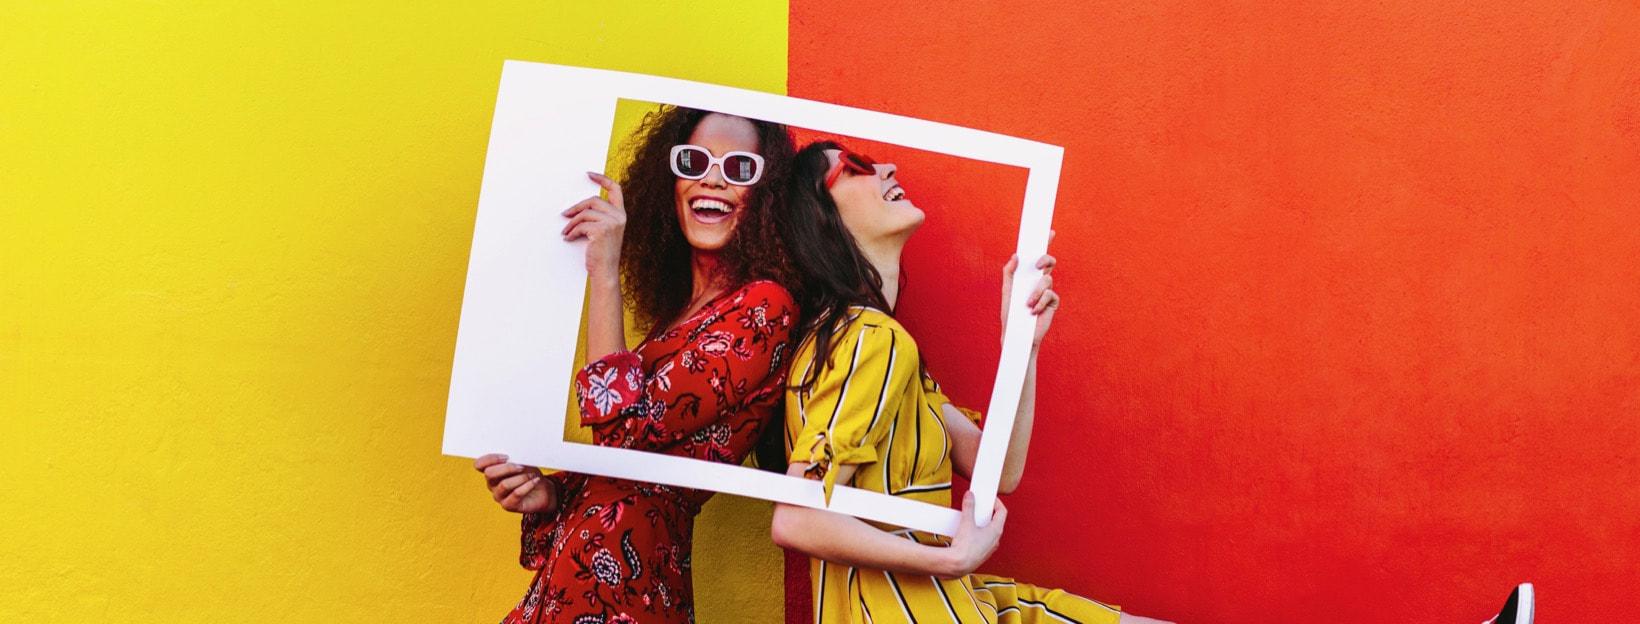 Social Media-Kampagne: Zwei Frauen mit Polaroid-Rahmen